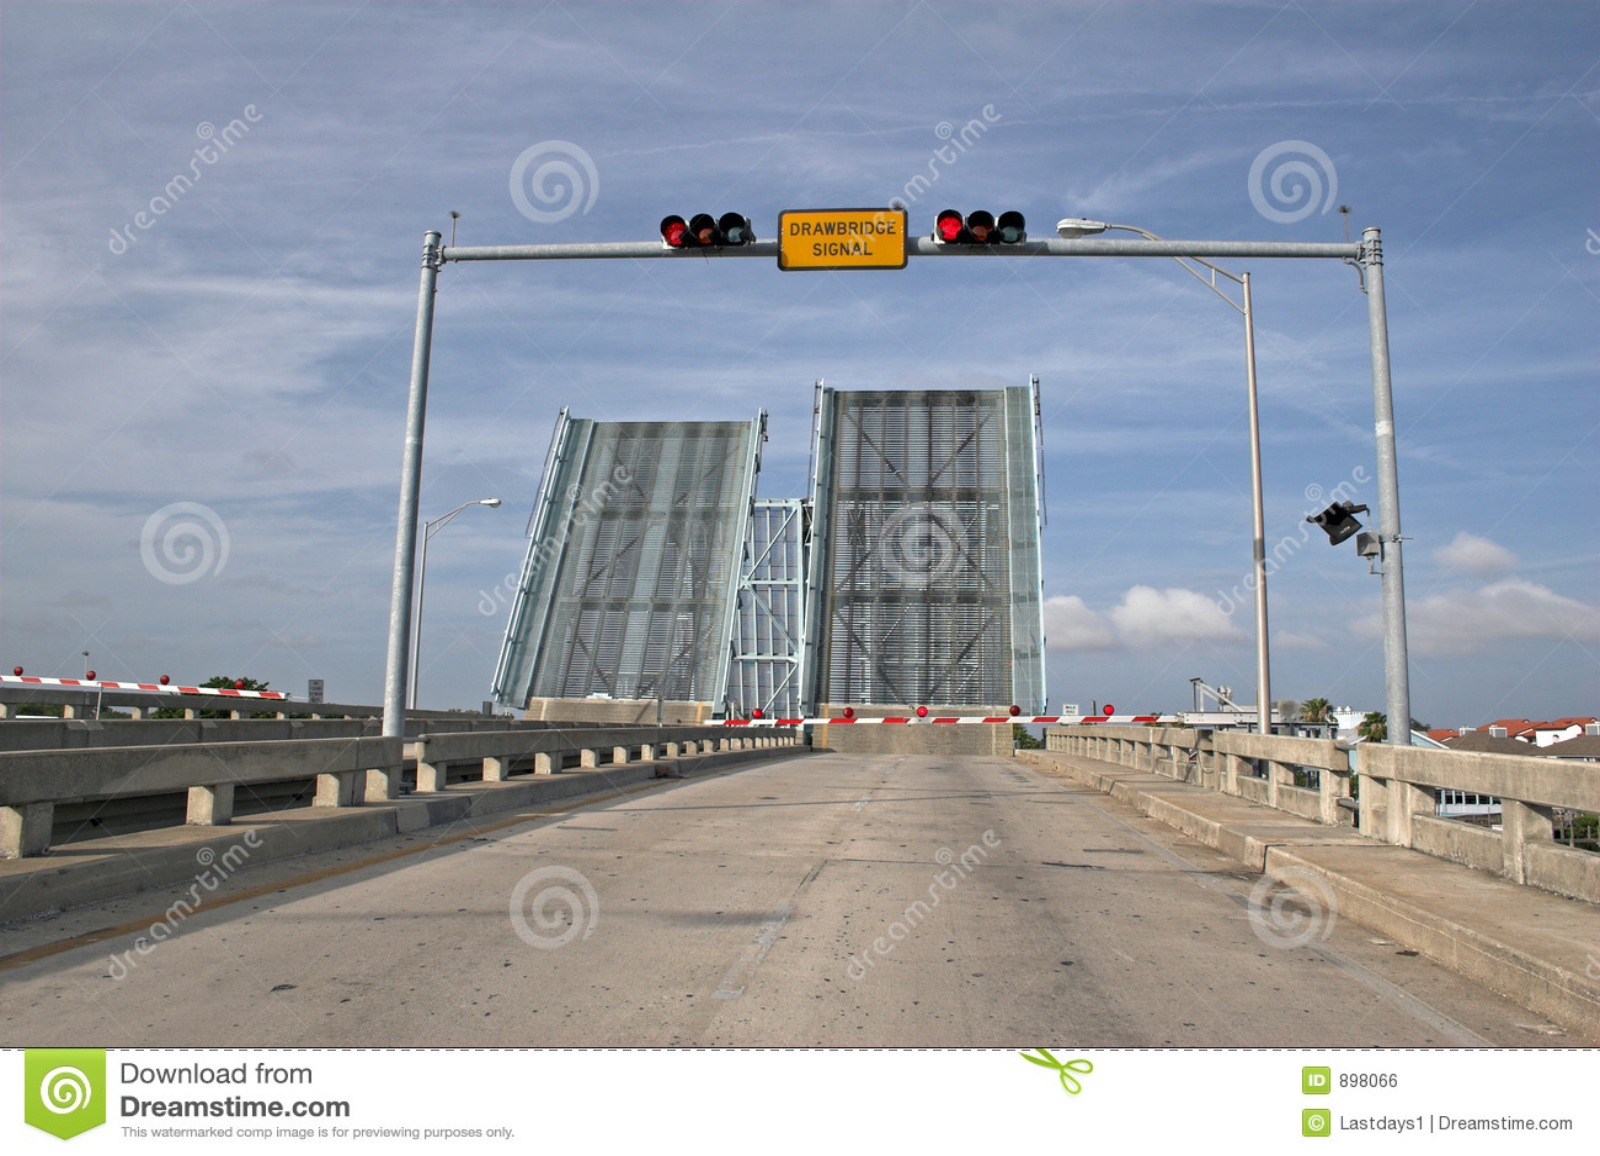 Bridge upp draw